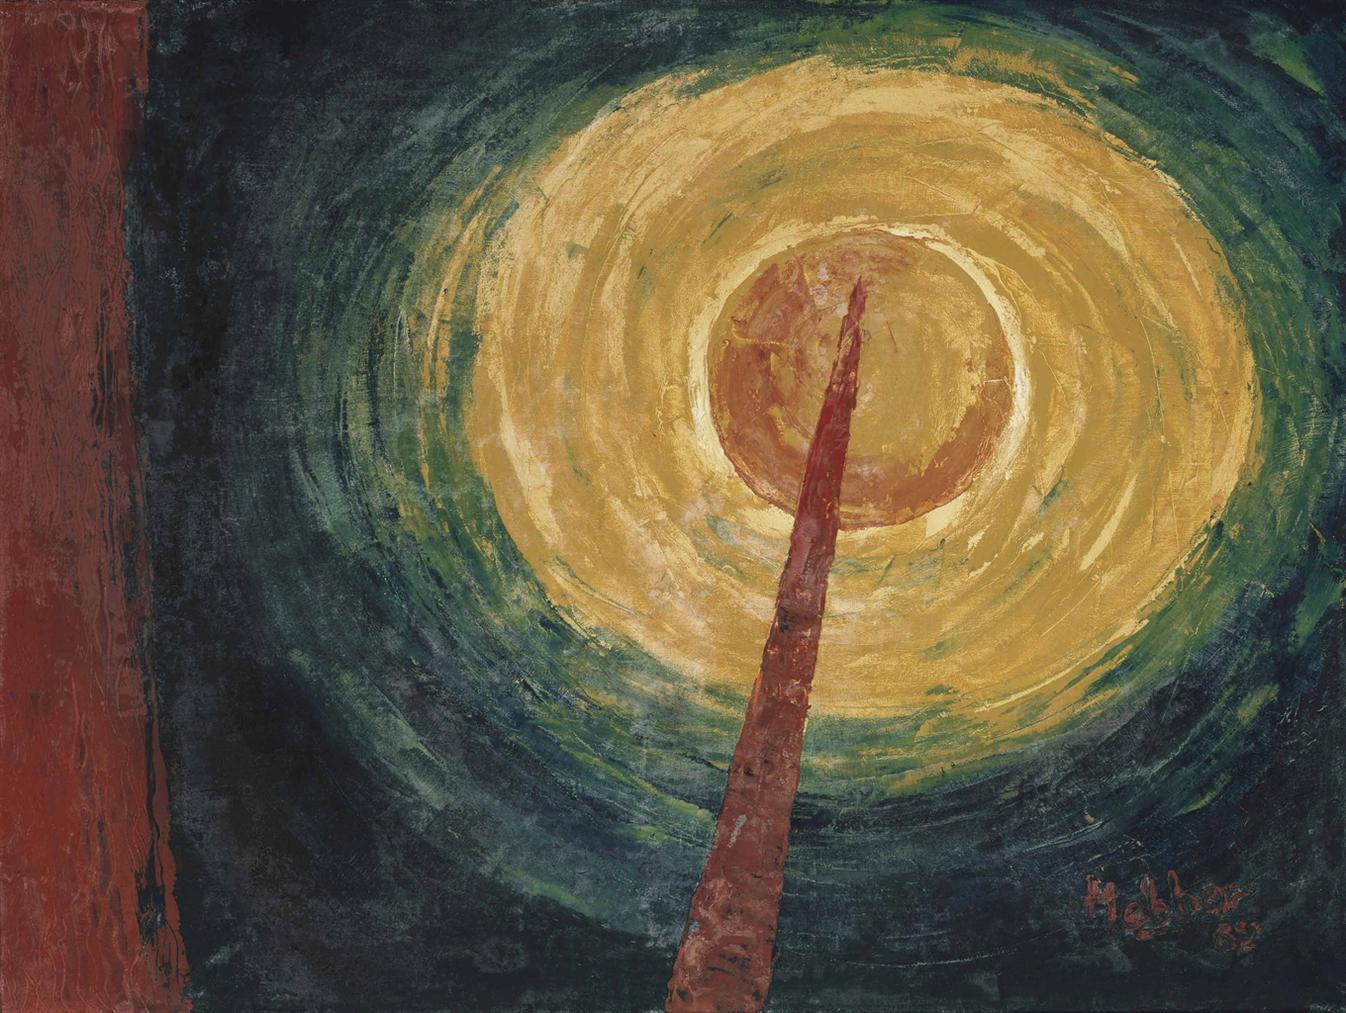 Kattingeri Krishna Hebbar - Untitled (Rocket Series)-1962